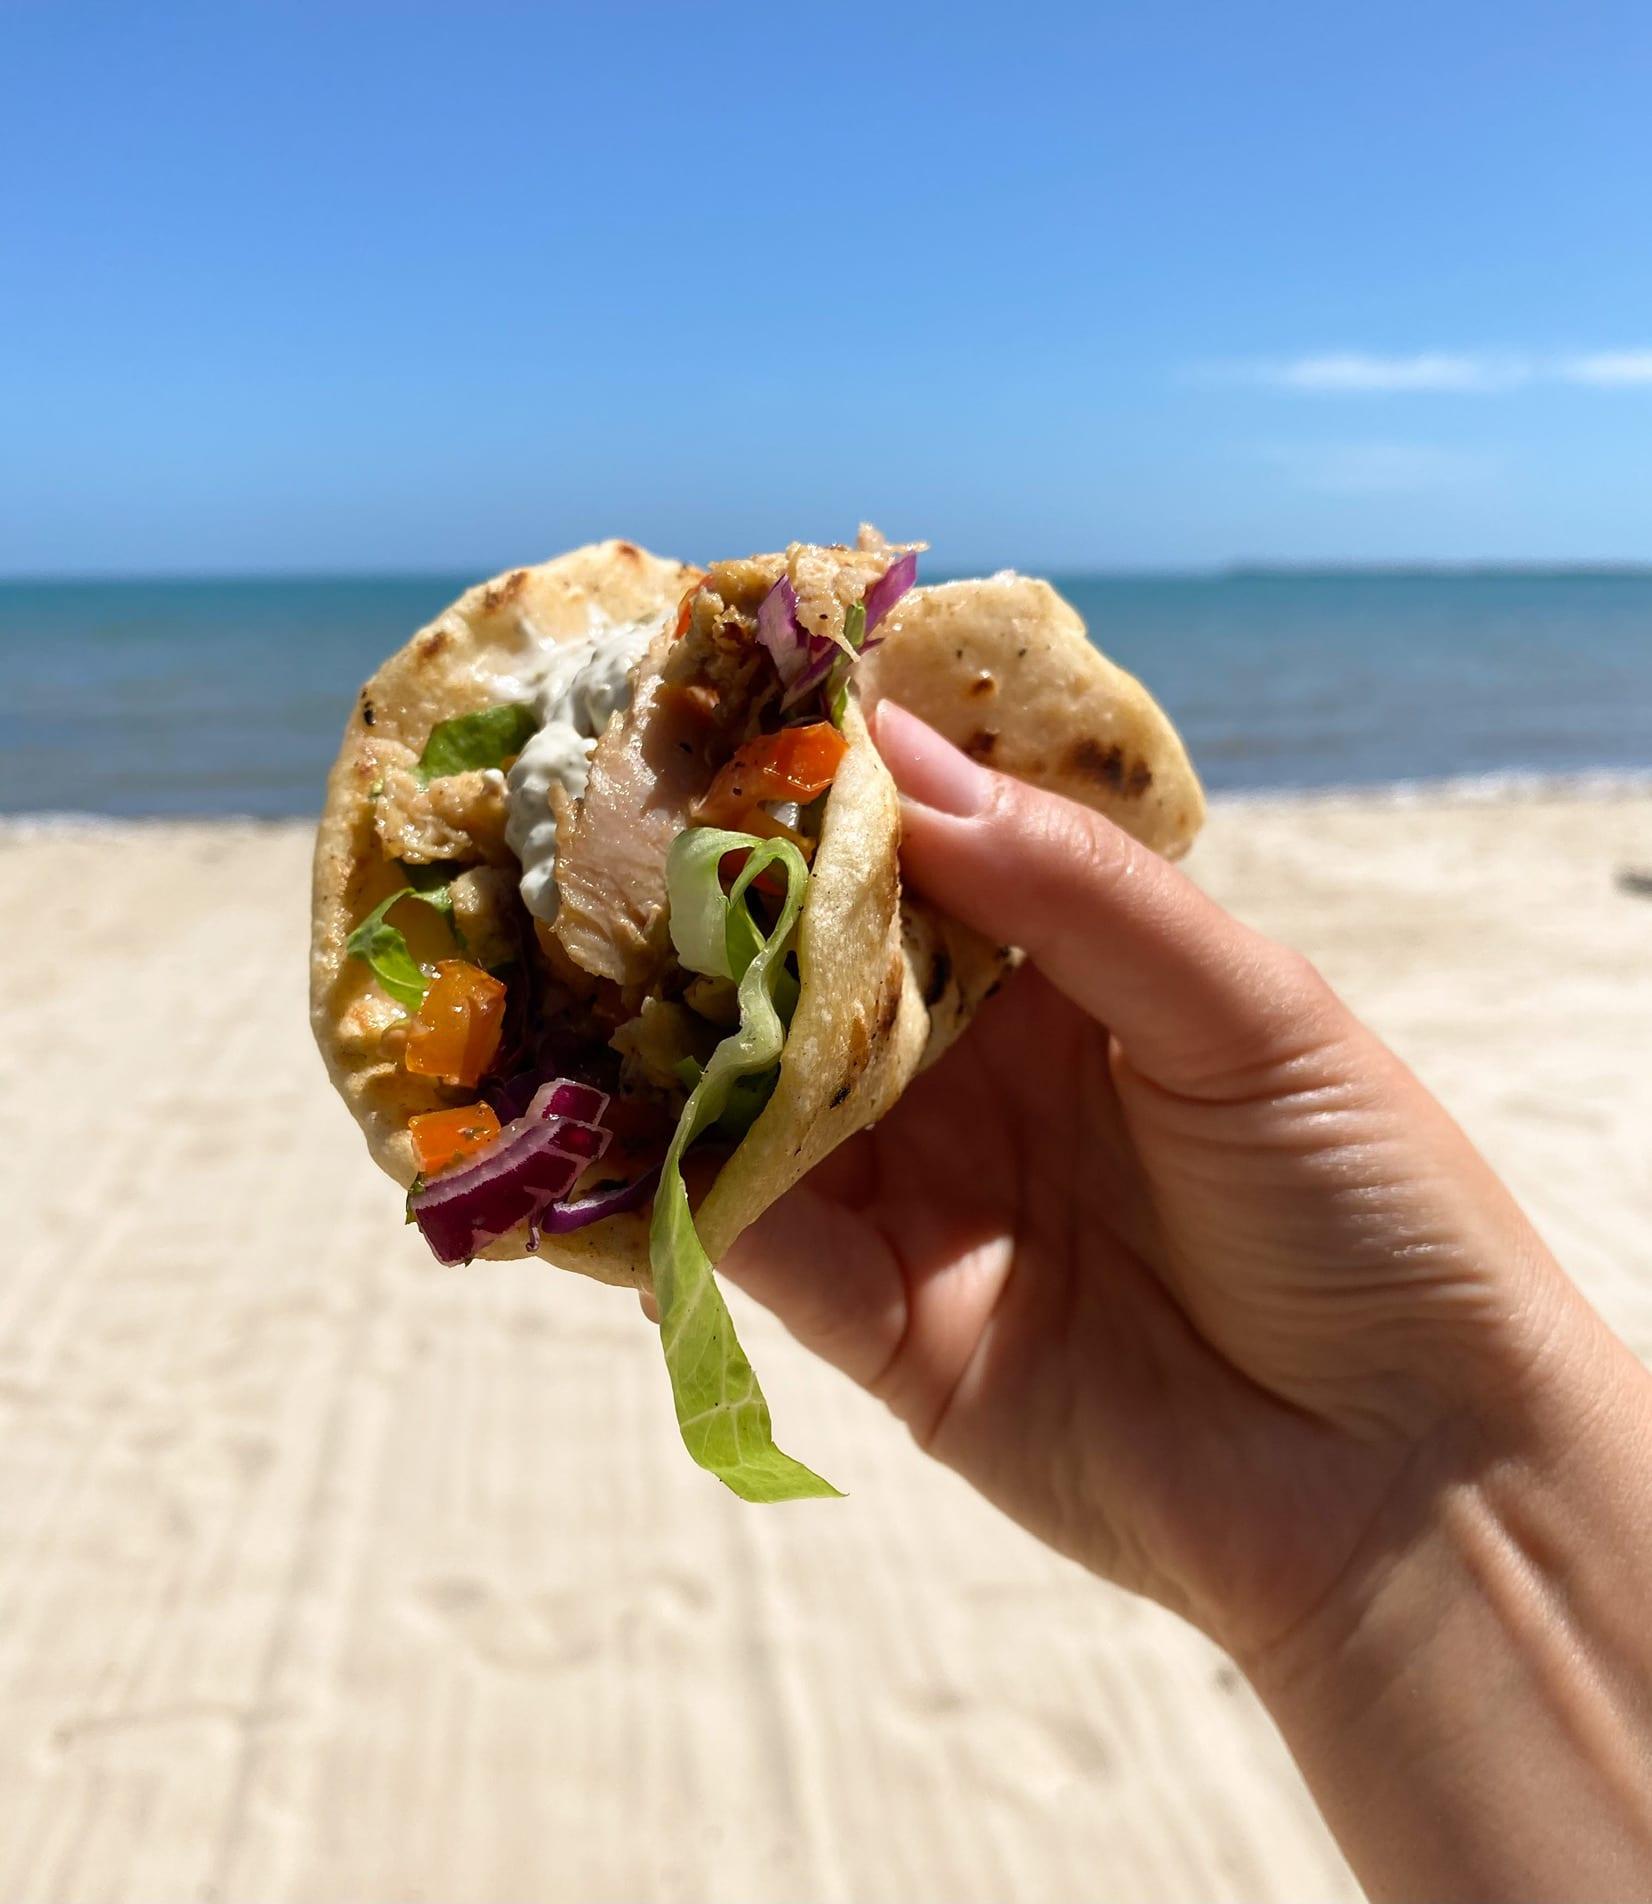 fish taco belize beach Rosanna digital nomad